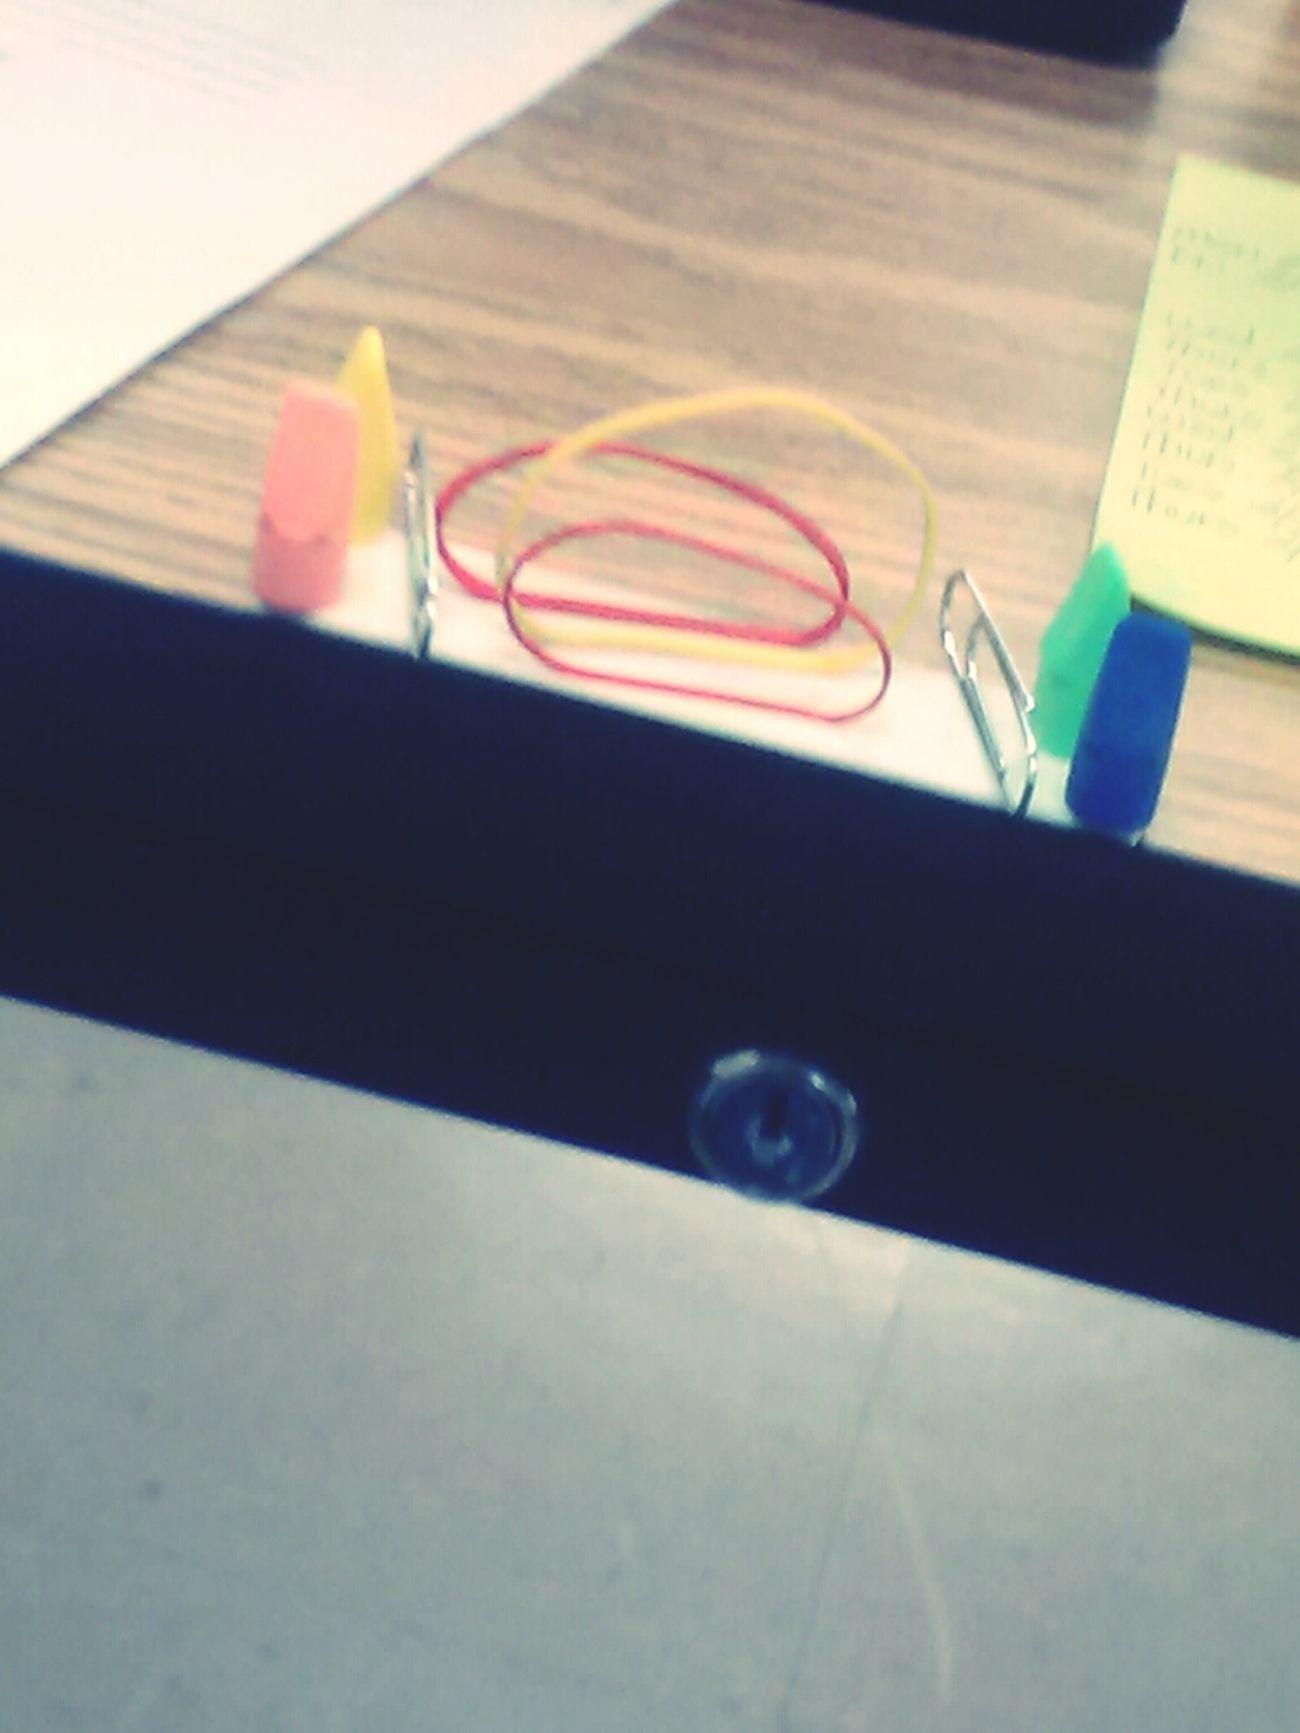 my creation on my language arts teachers desk